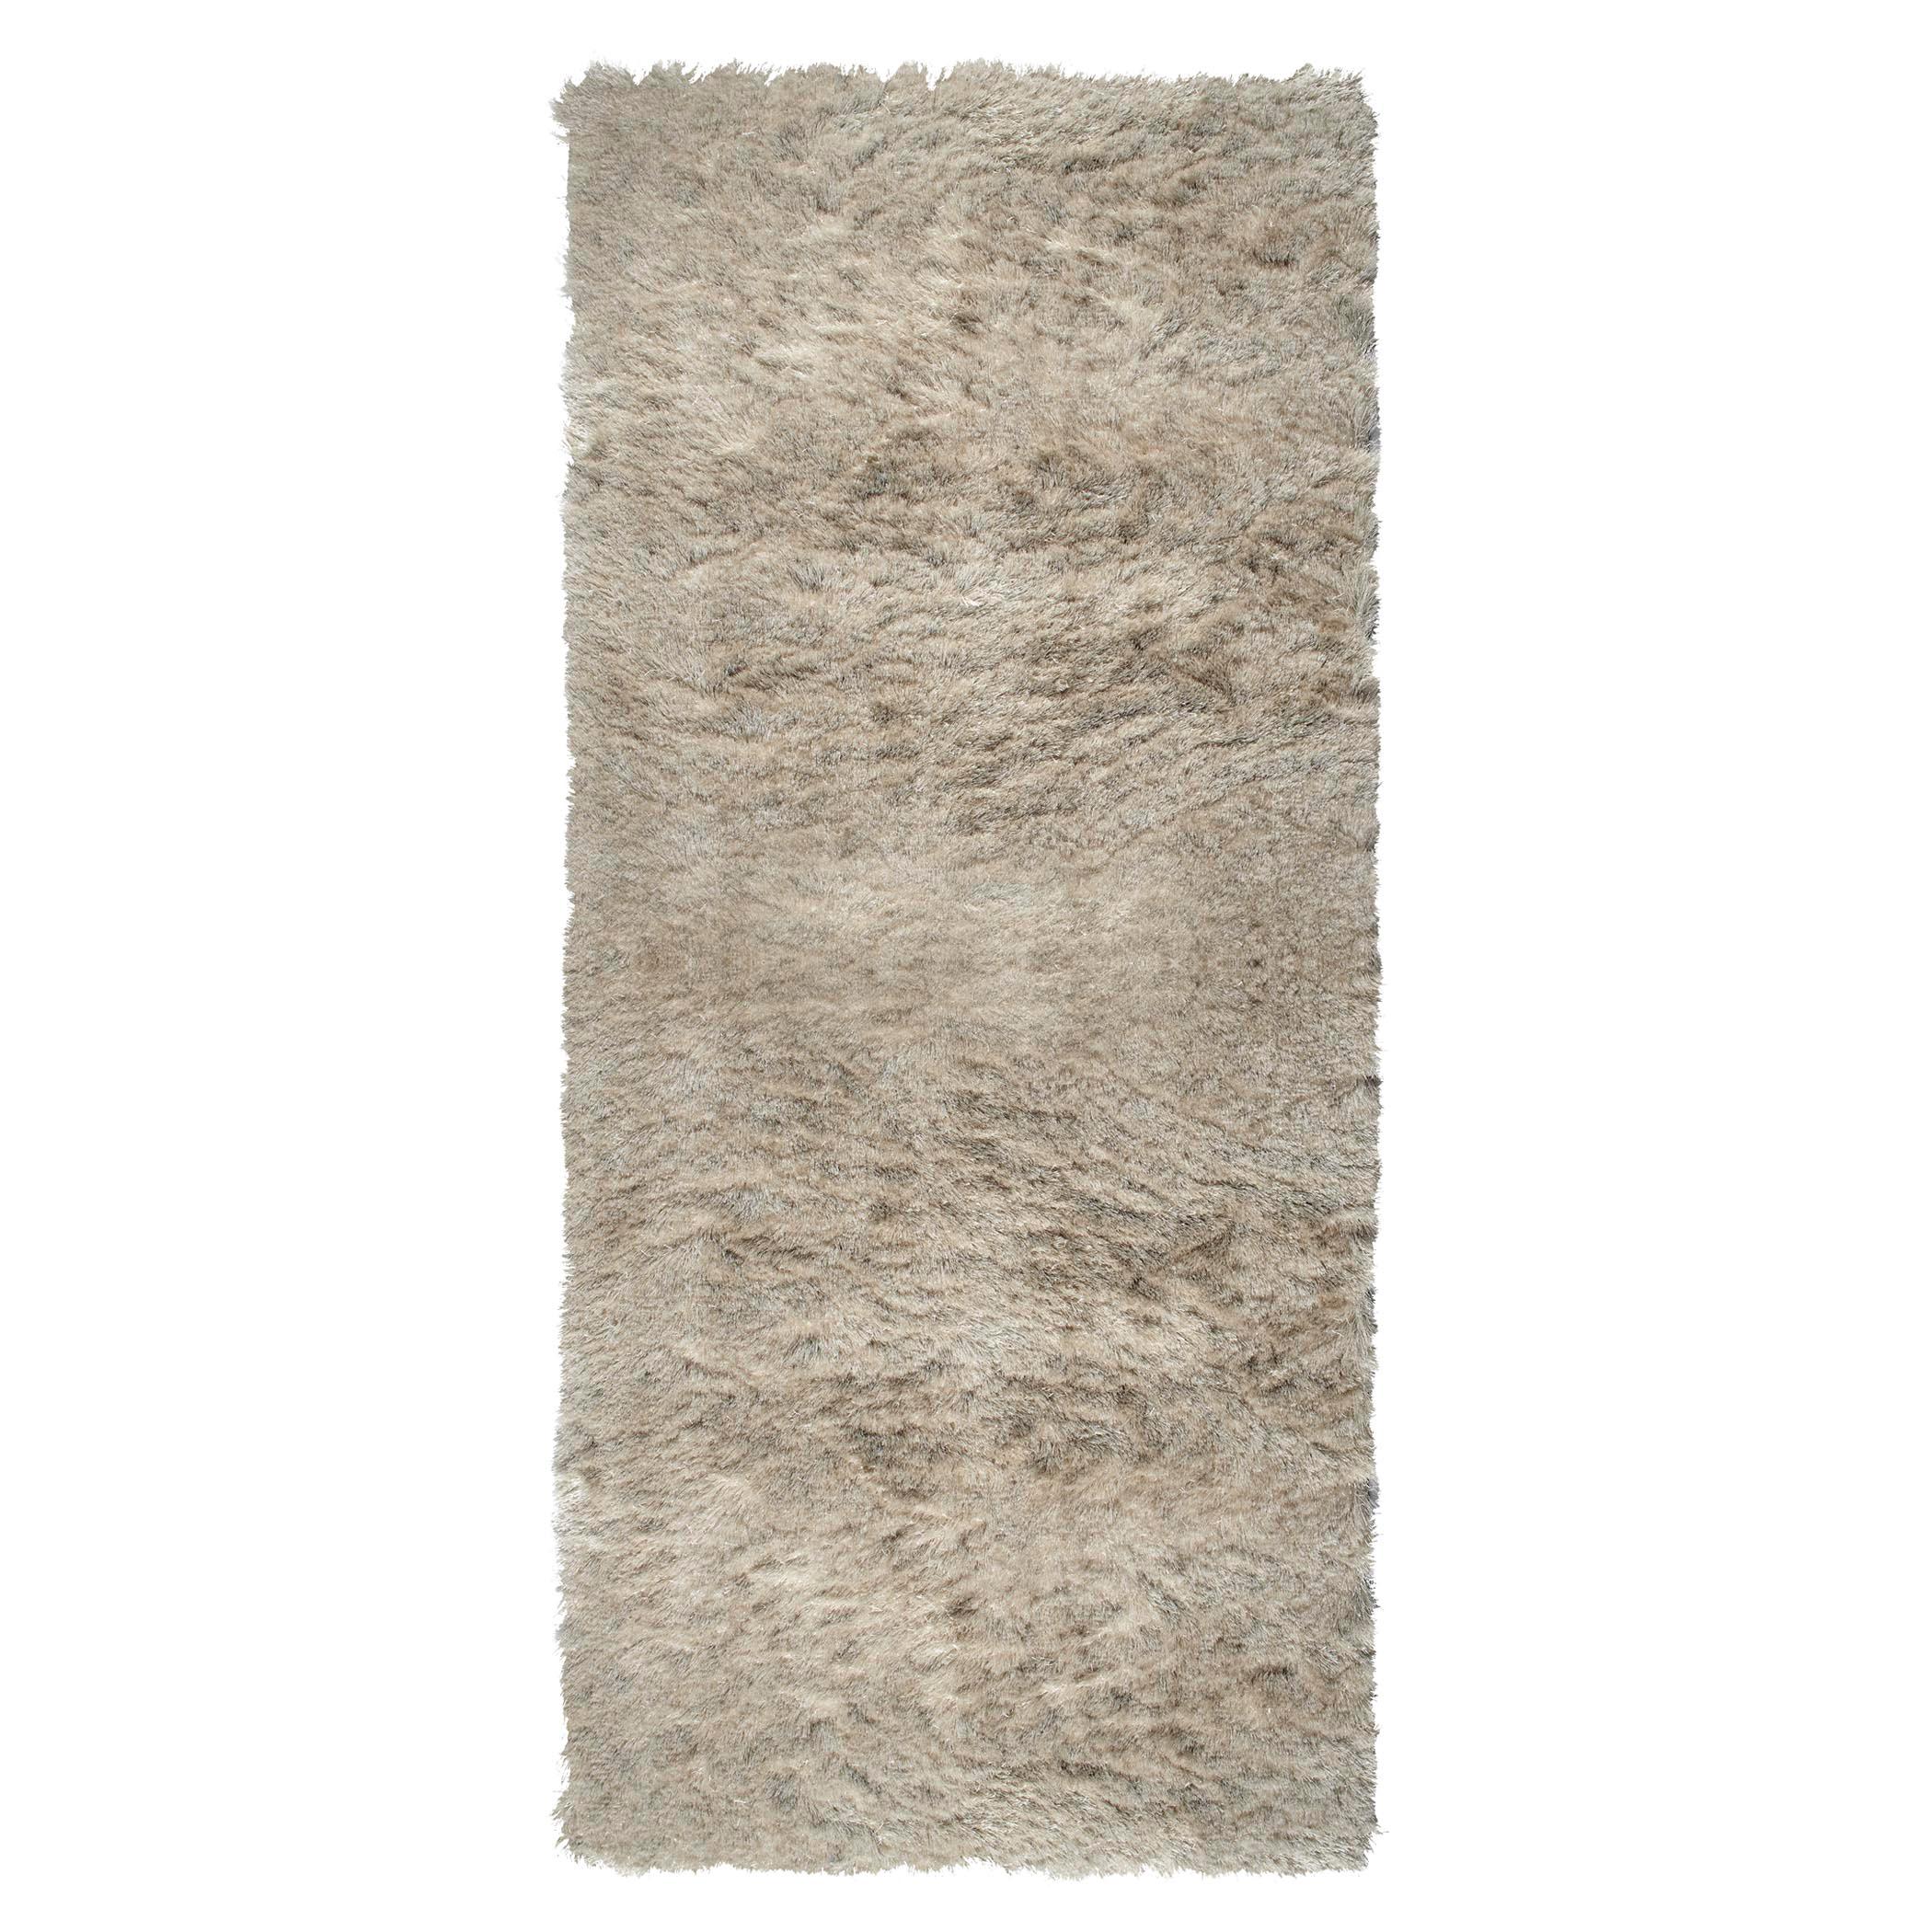 Indochine Rug - Sand